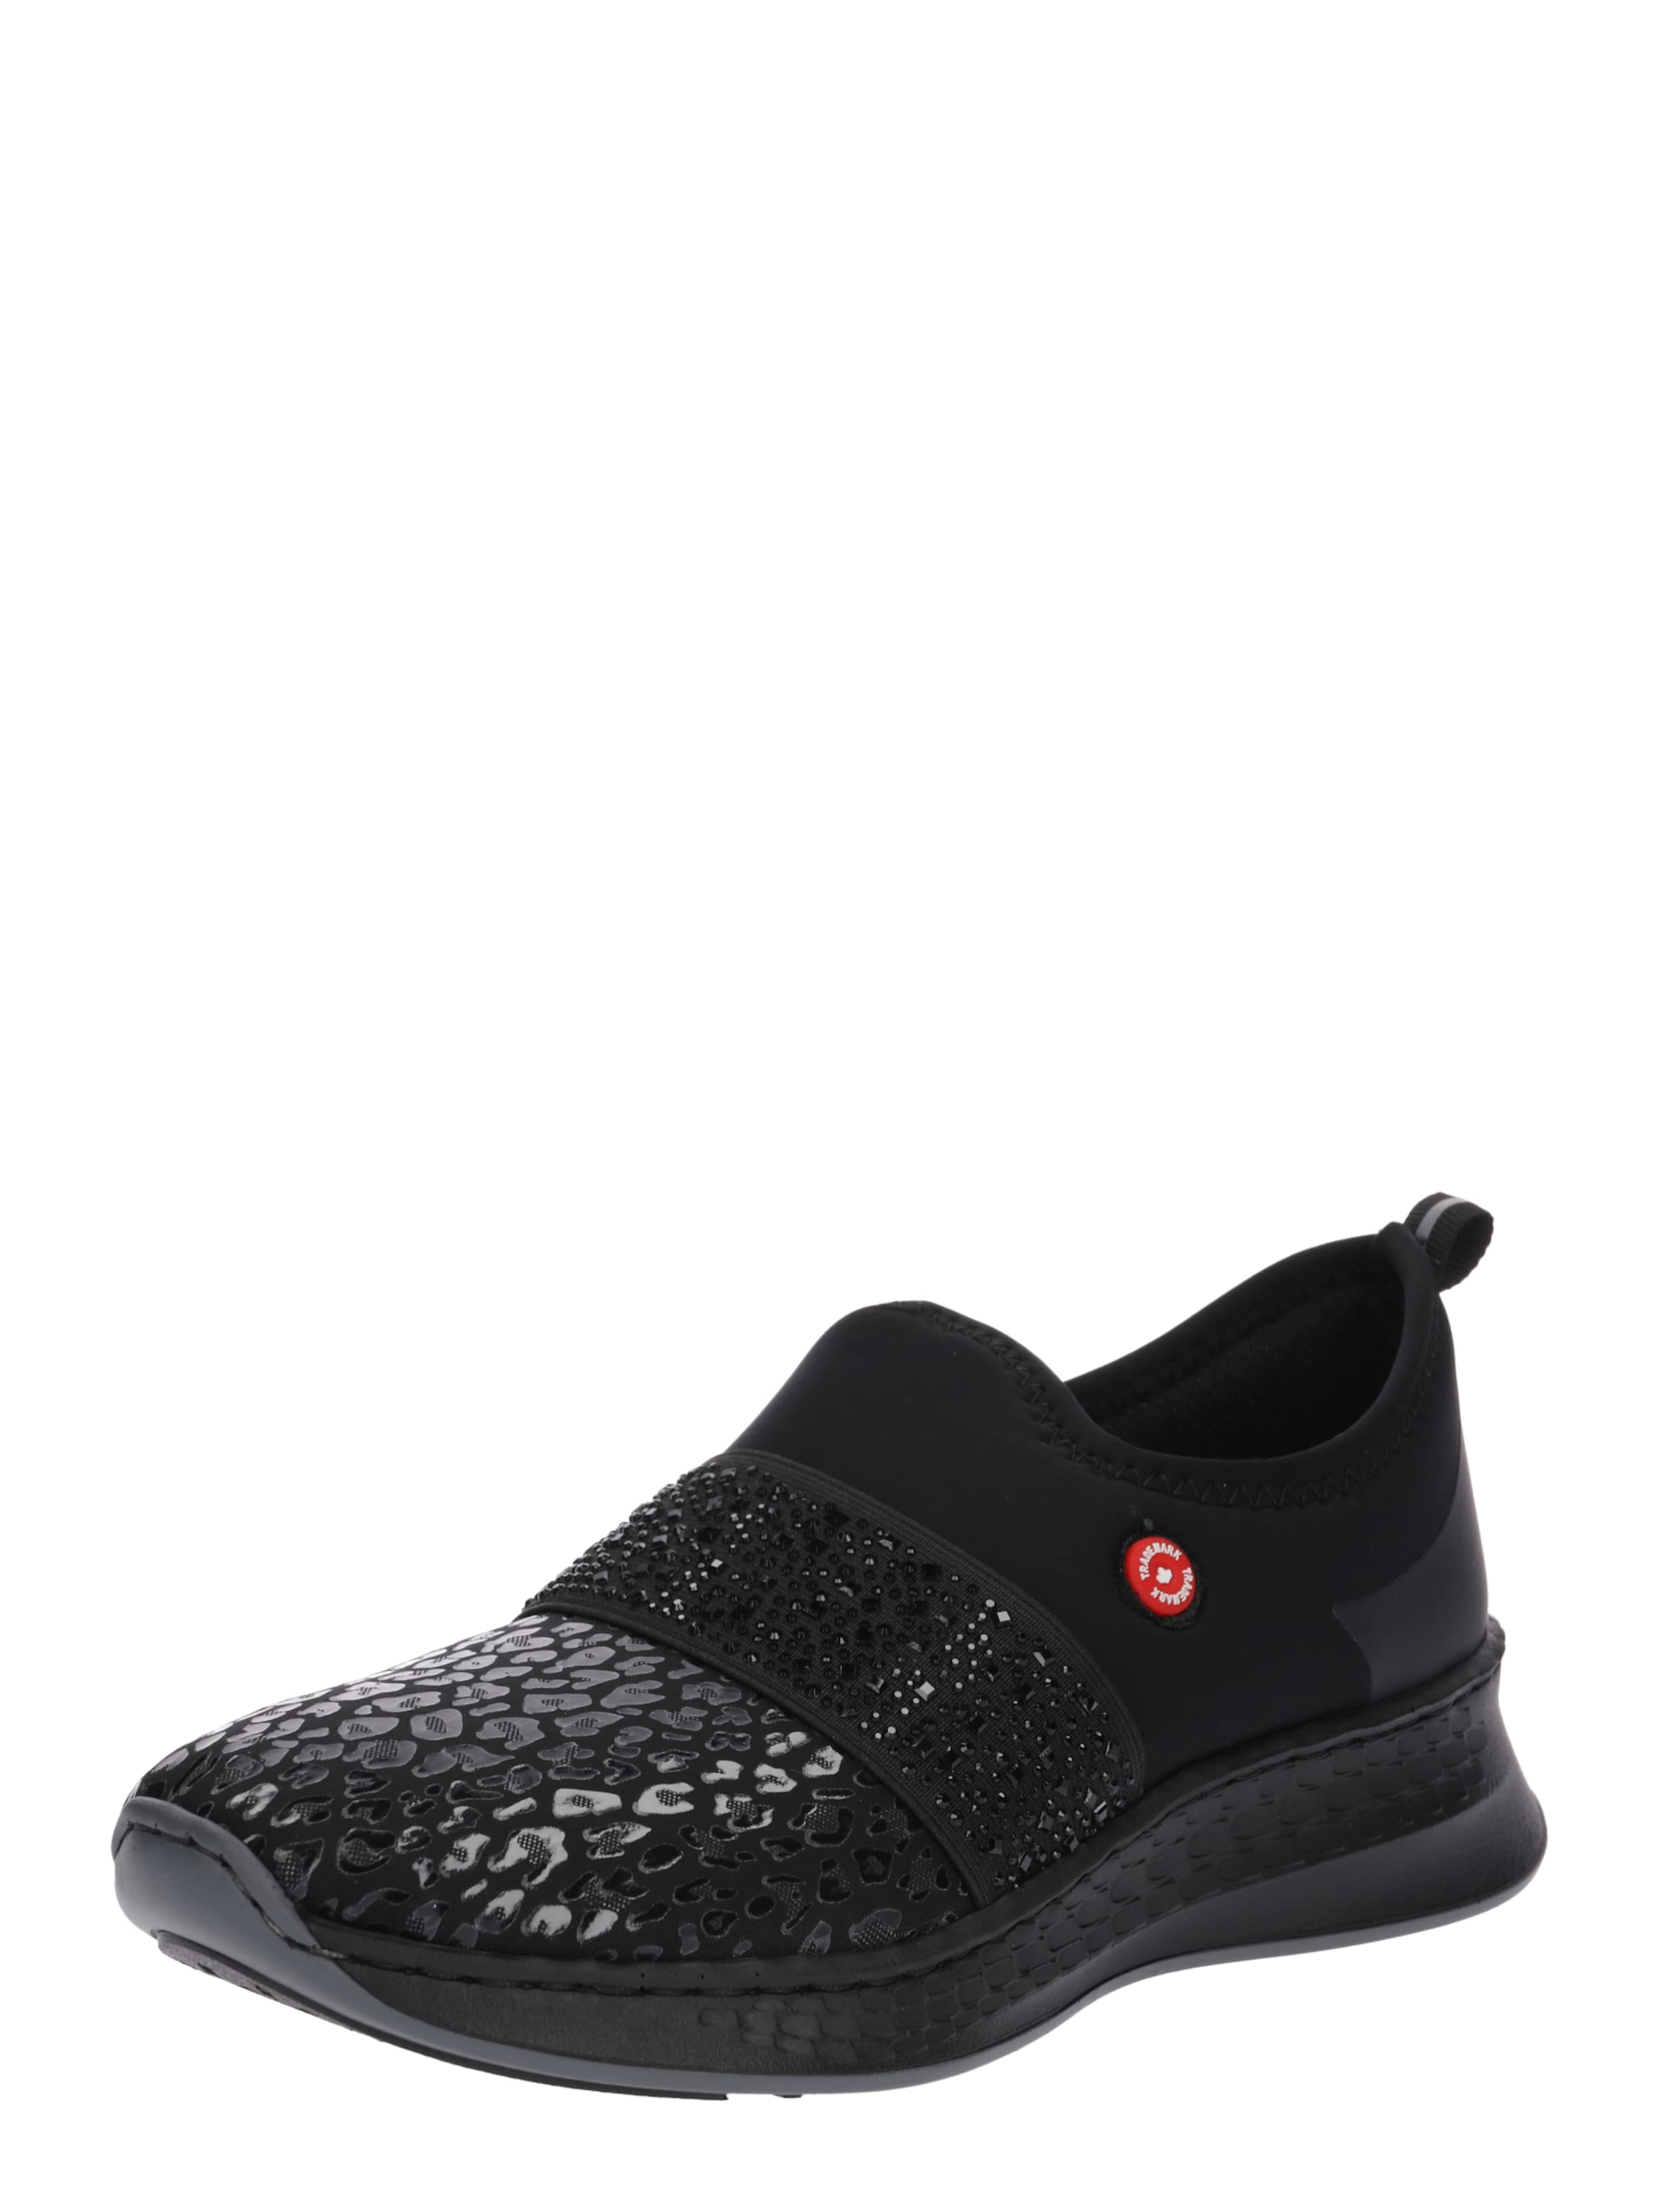 RIEKER Slipper im Sneaker-Look Günstige und langlebige Schuhe